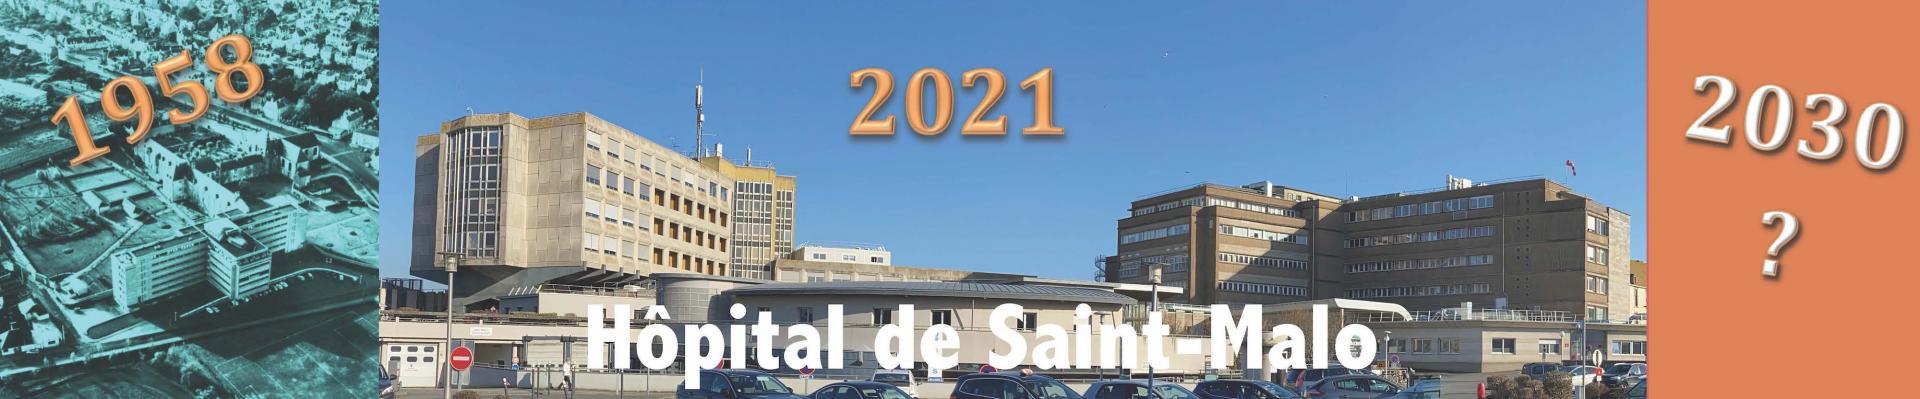 2030 1